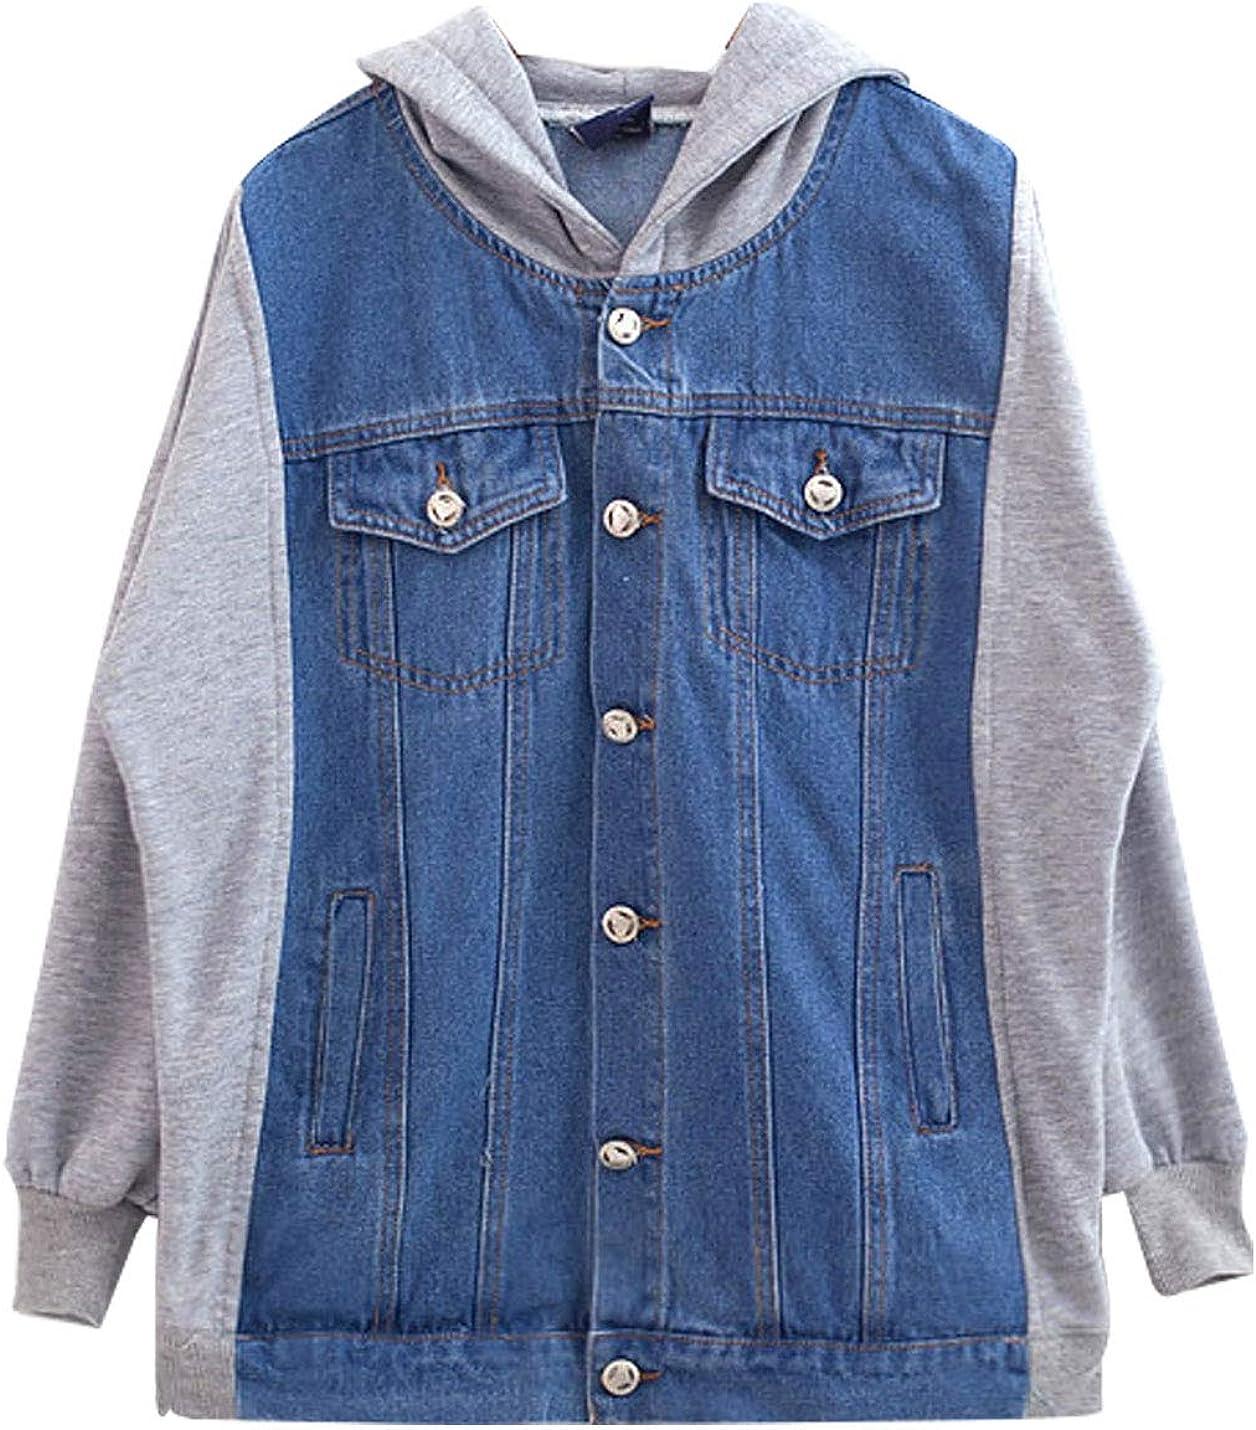 Omoone Women's Long Sleeve Hooded Loose Jean Patchwork Denim Jacket Coats